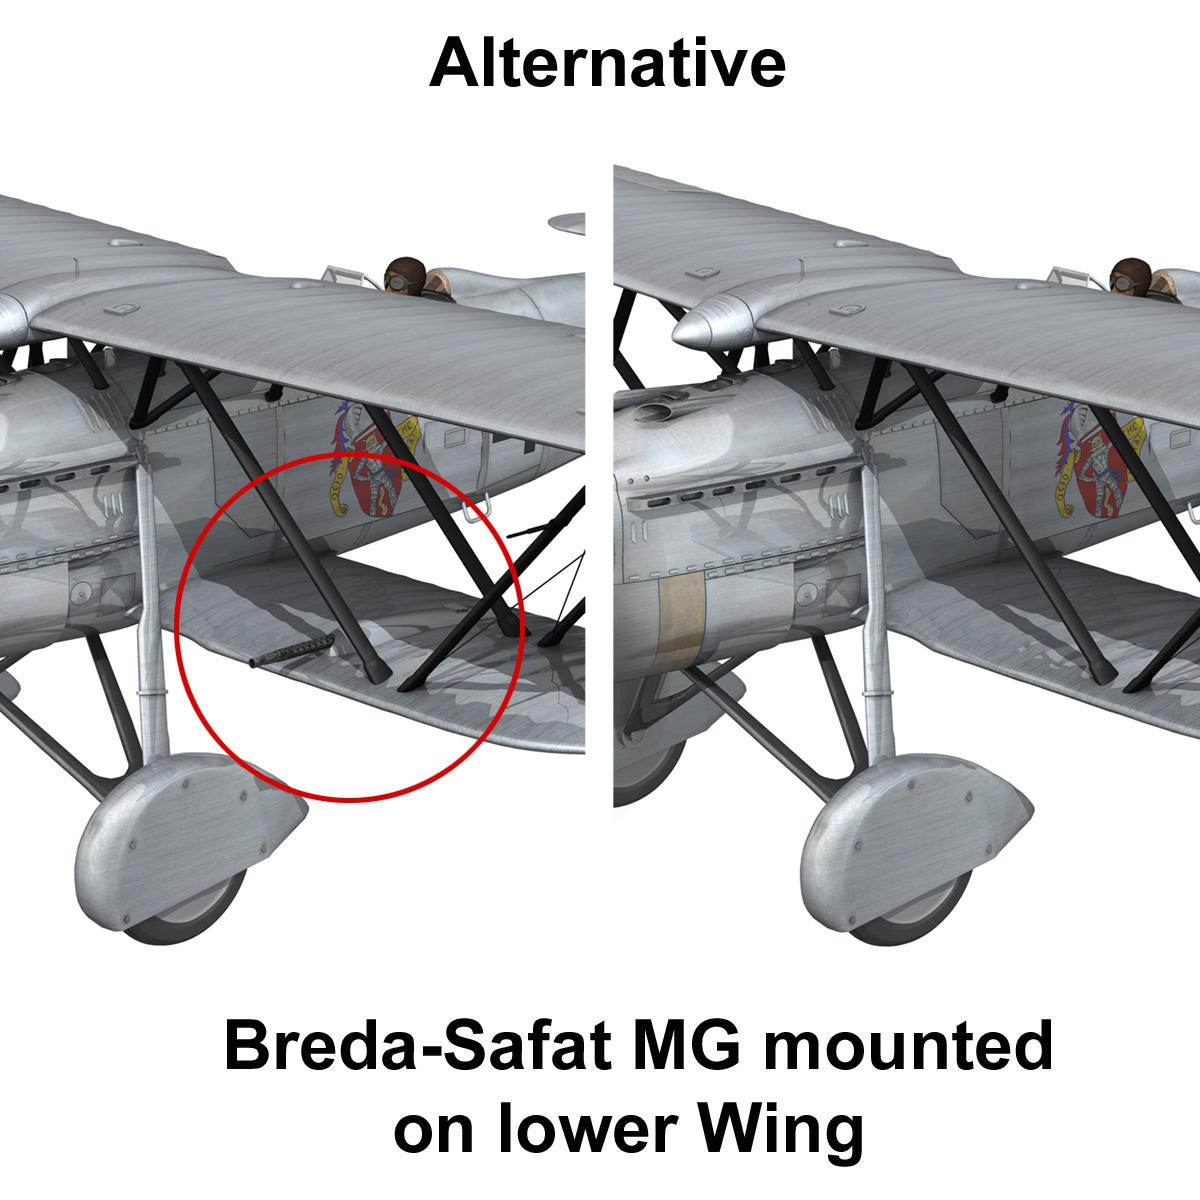 fiat cr.32 – italy air force – gruppo baleari 3d model fbx c4d lwo obj 252219